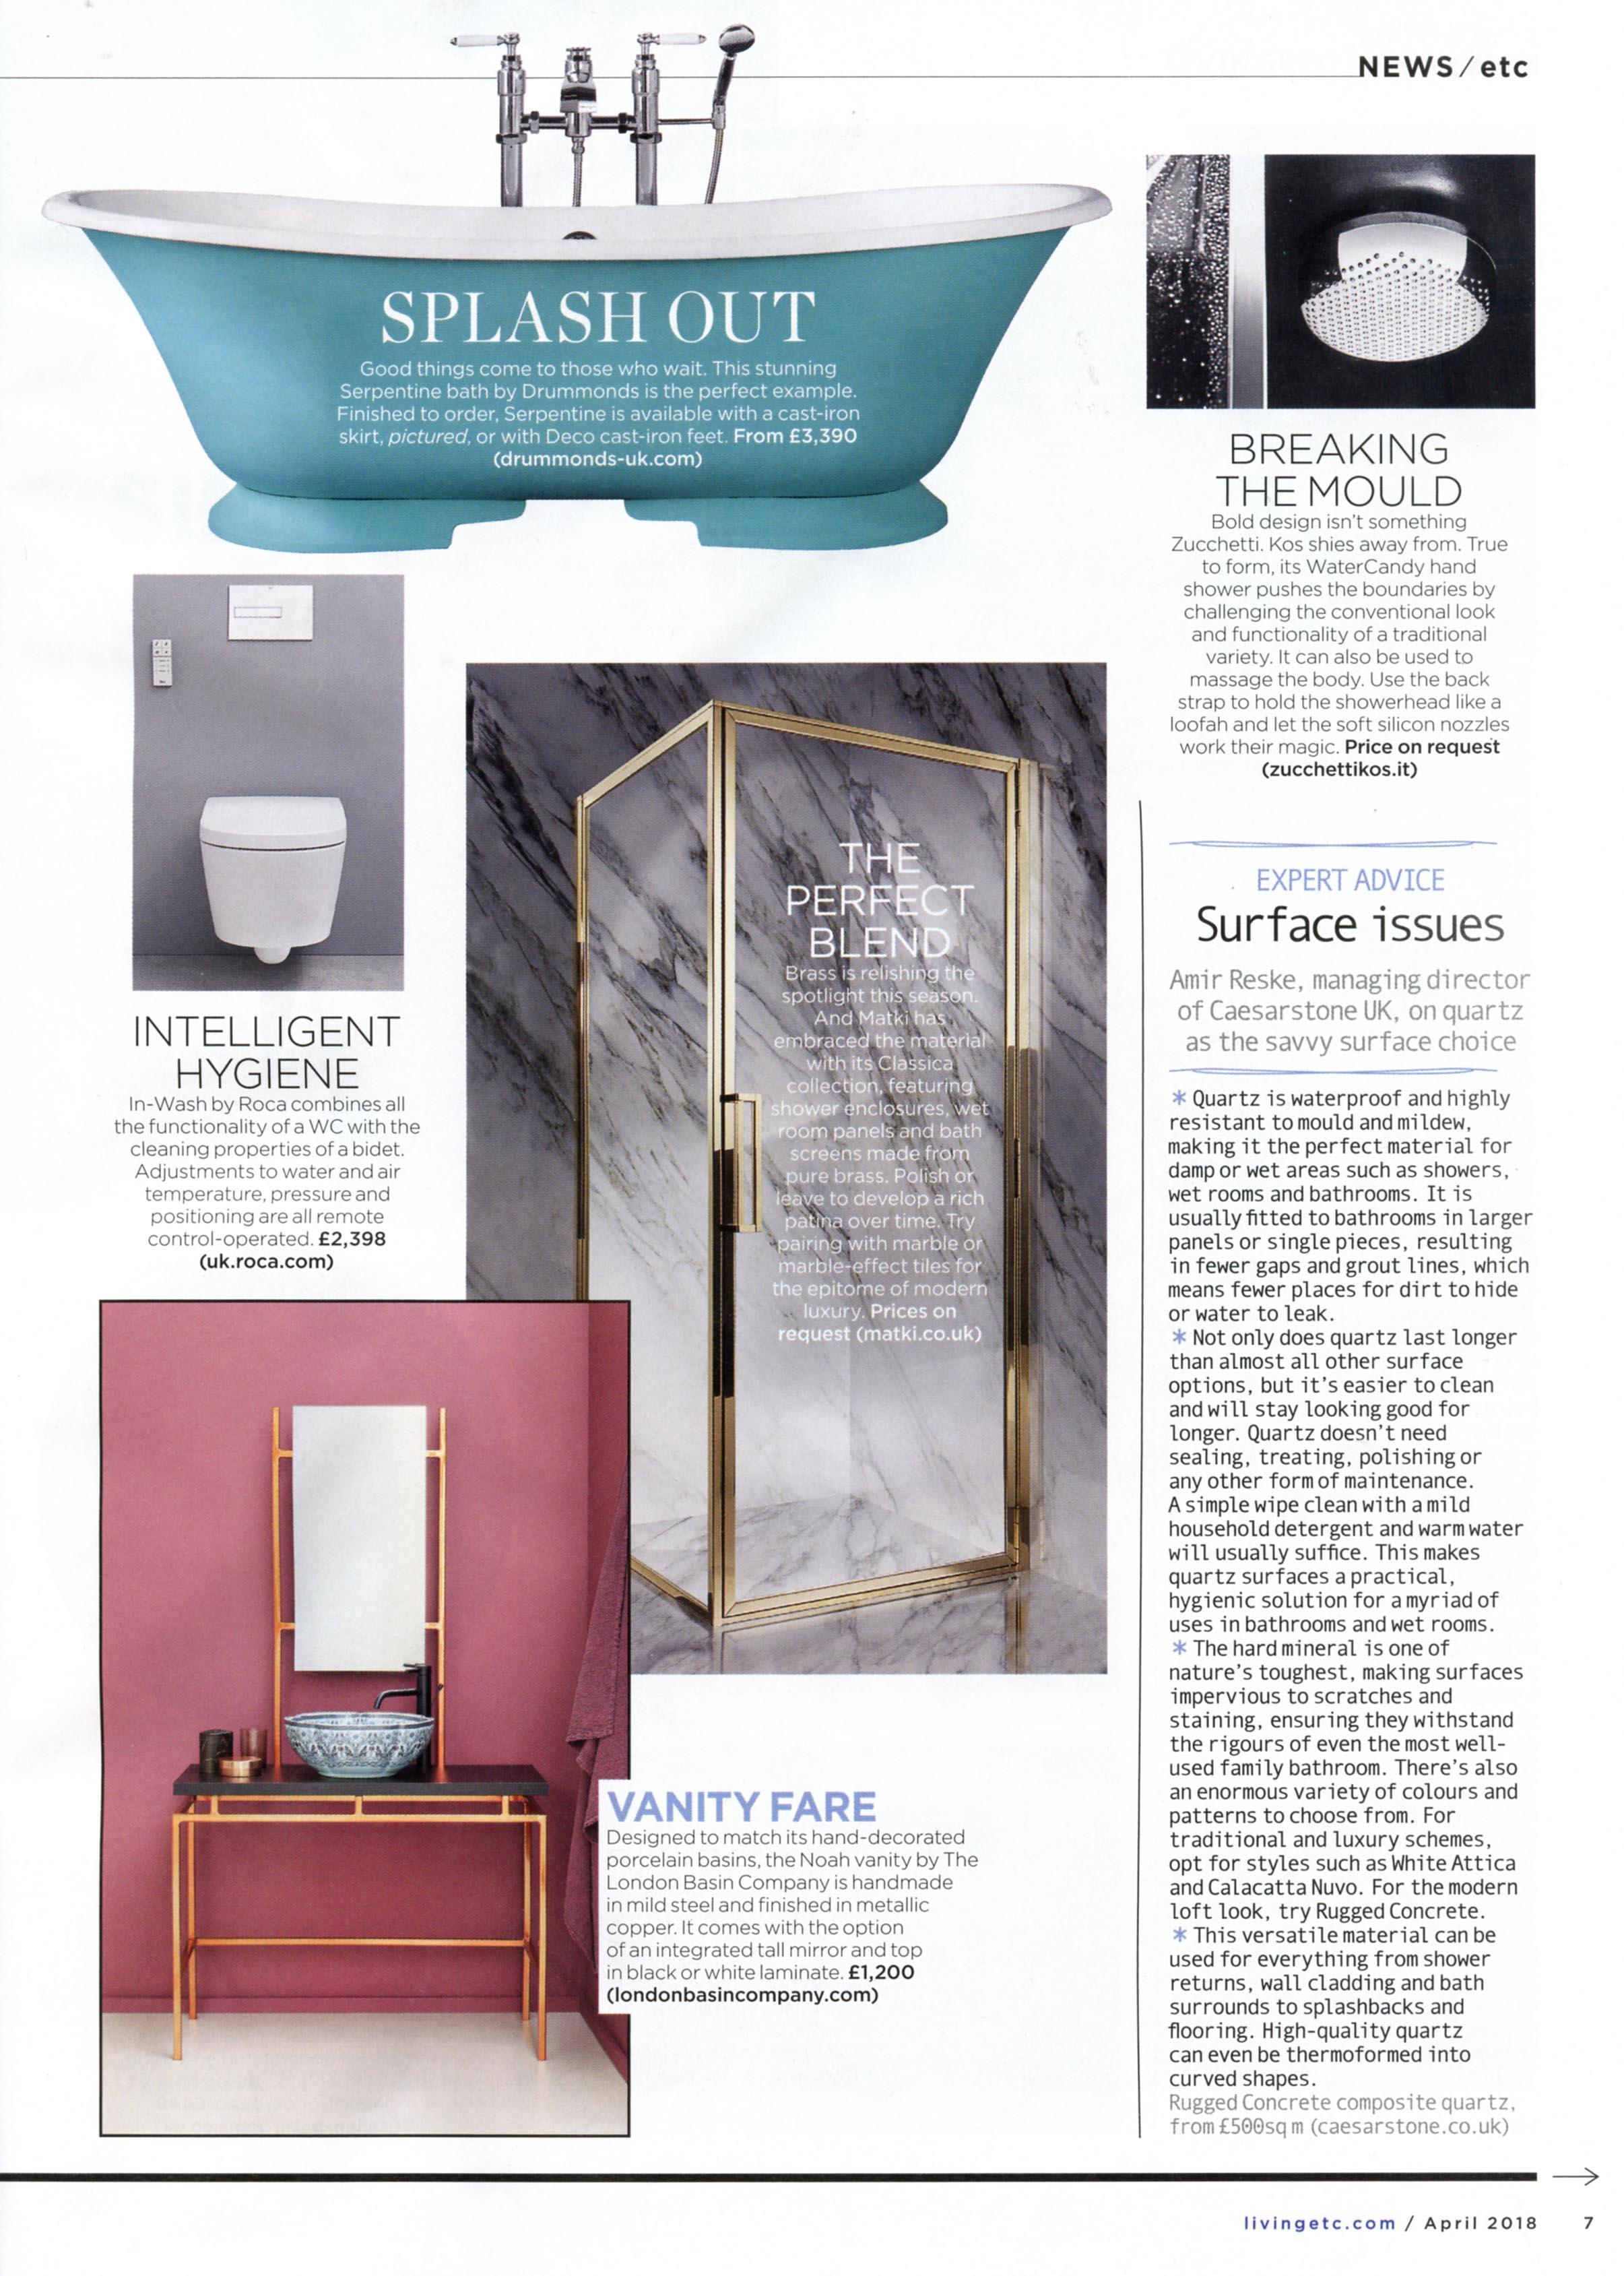 Living Etc April 2018 - Bathrooms 2018 Supplement - LBC.jpg